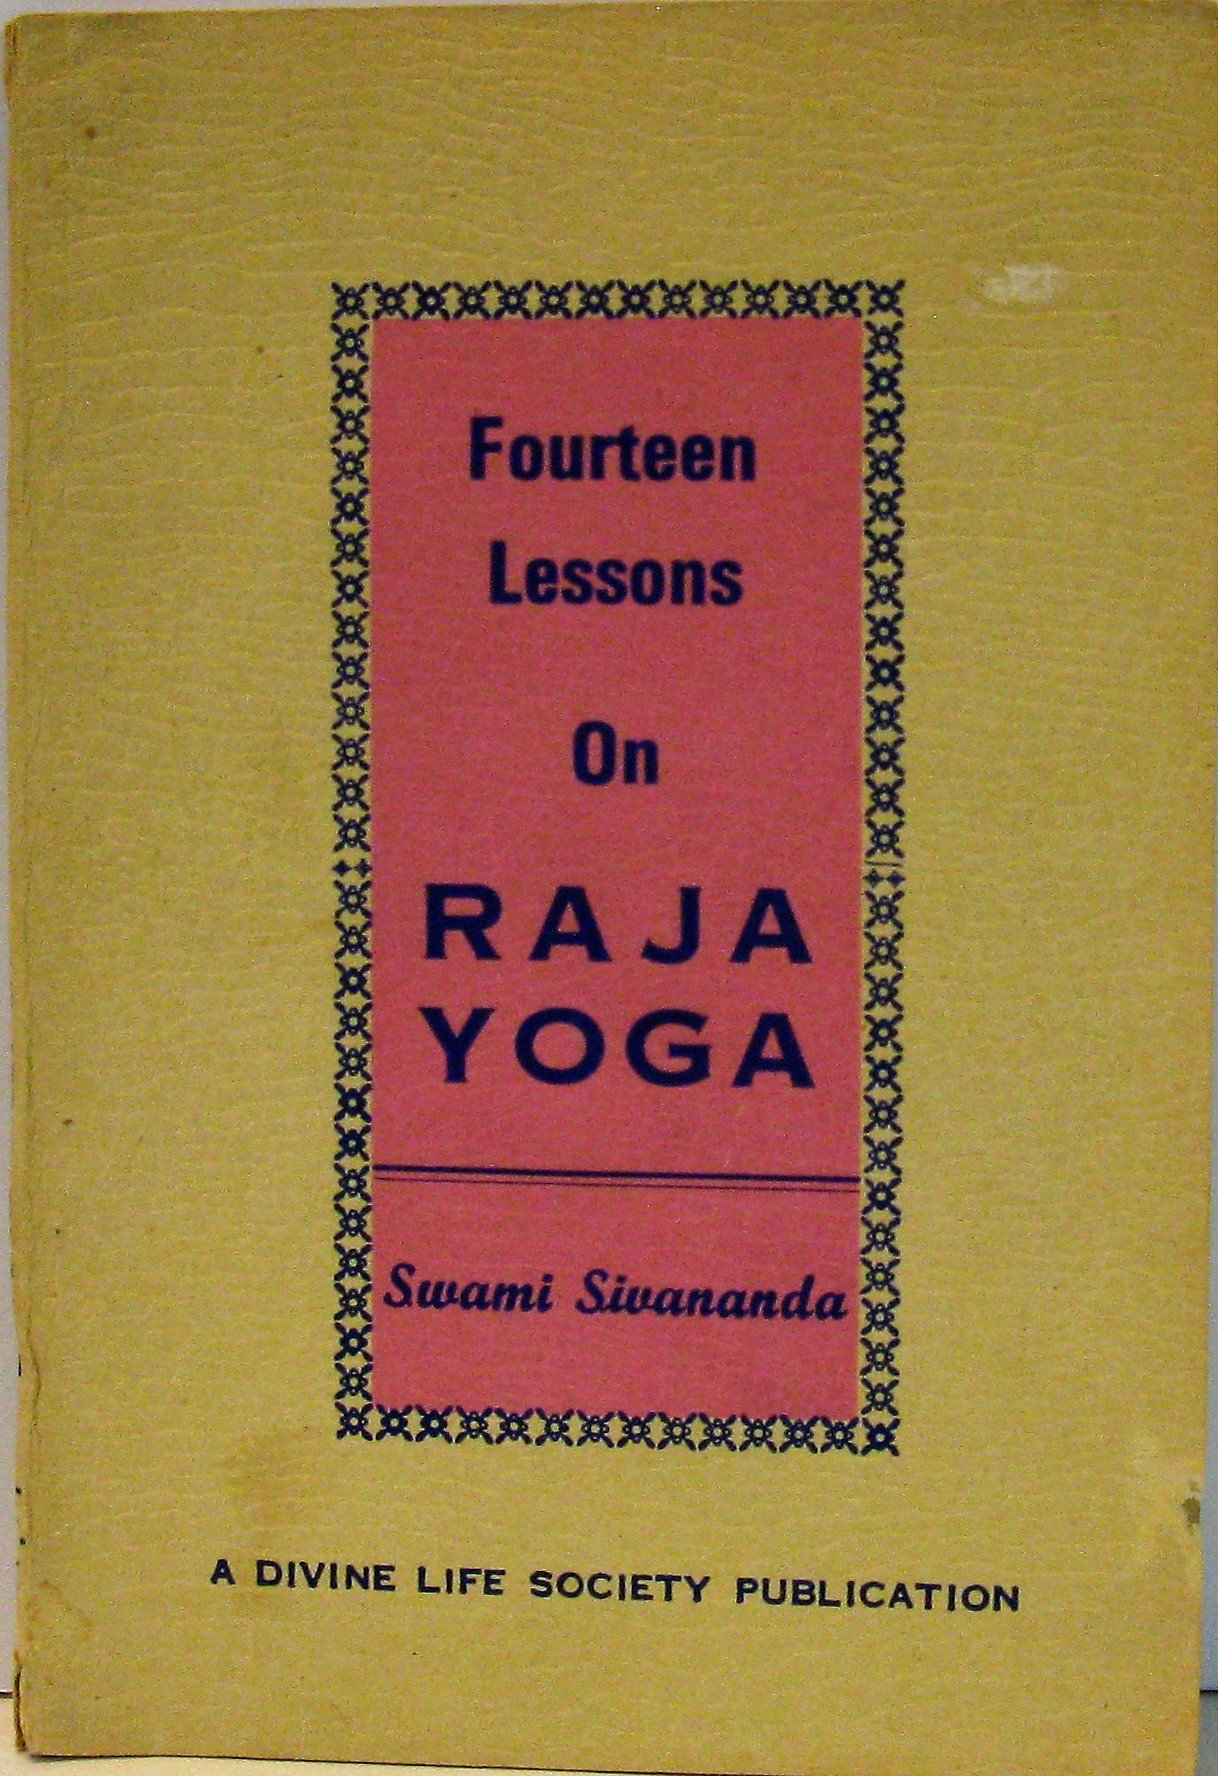 Fourteen lessons in raja yoga: Sivananda: Amazon.com: Books